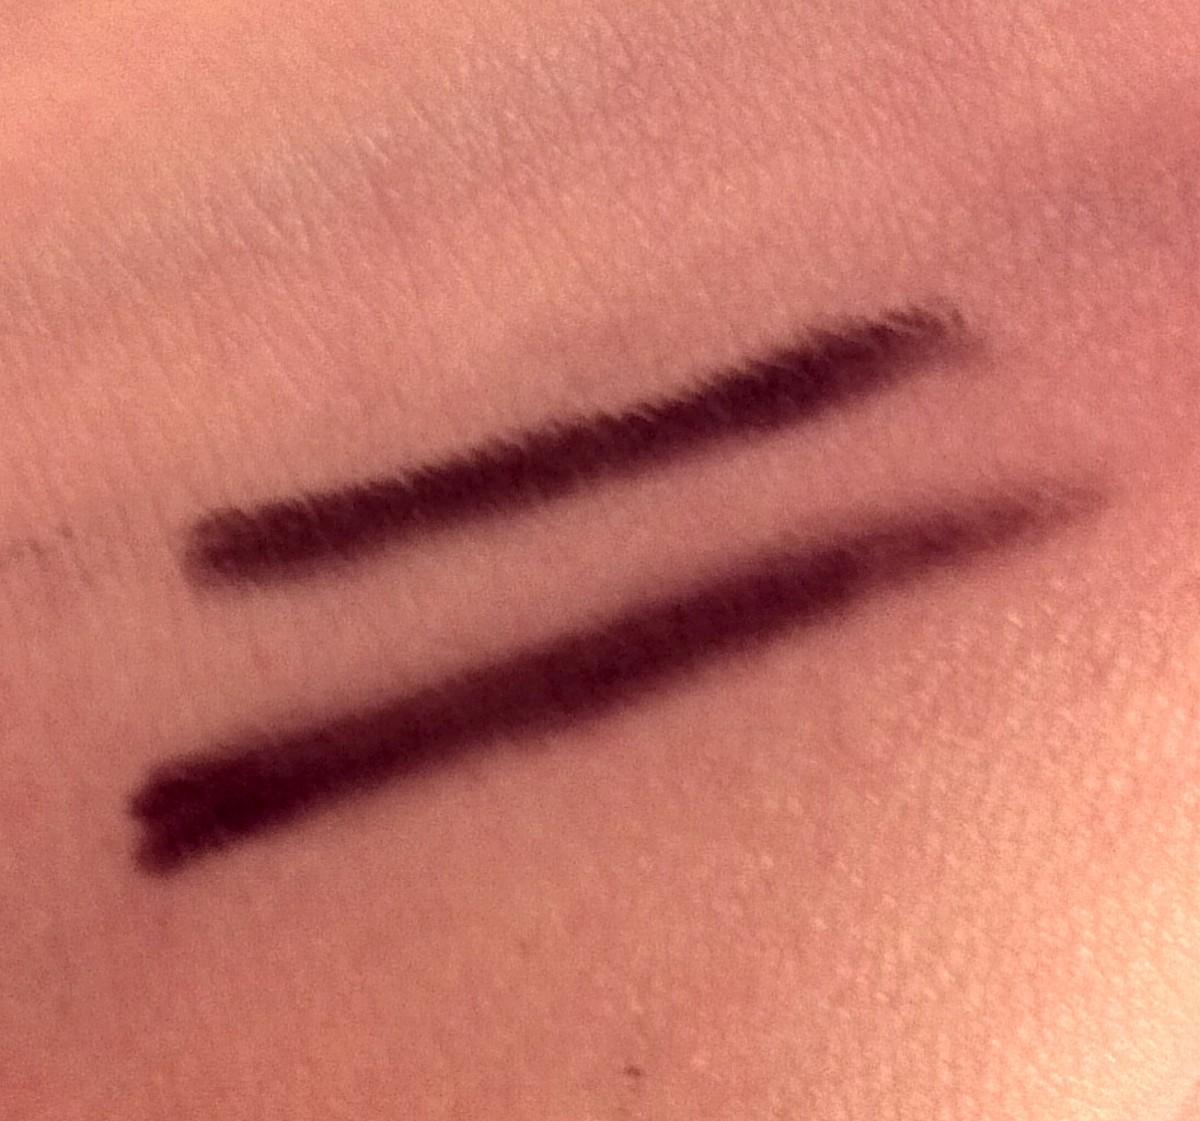 Kajal eyeliner applied